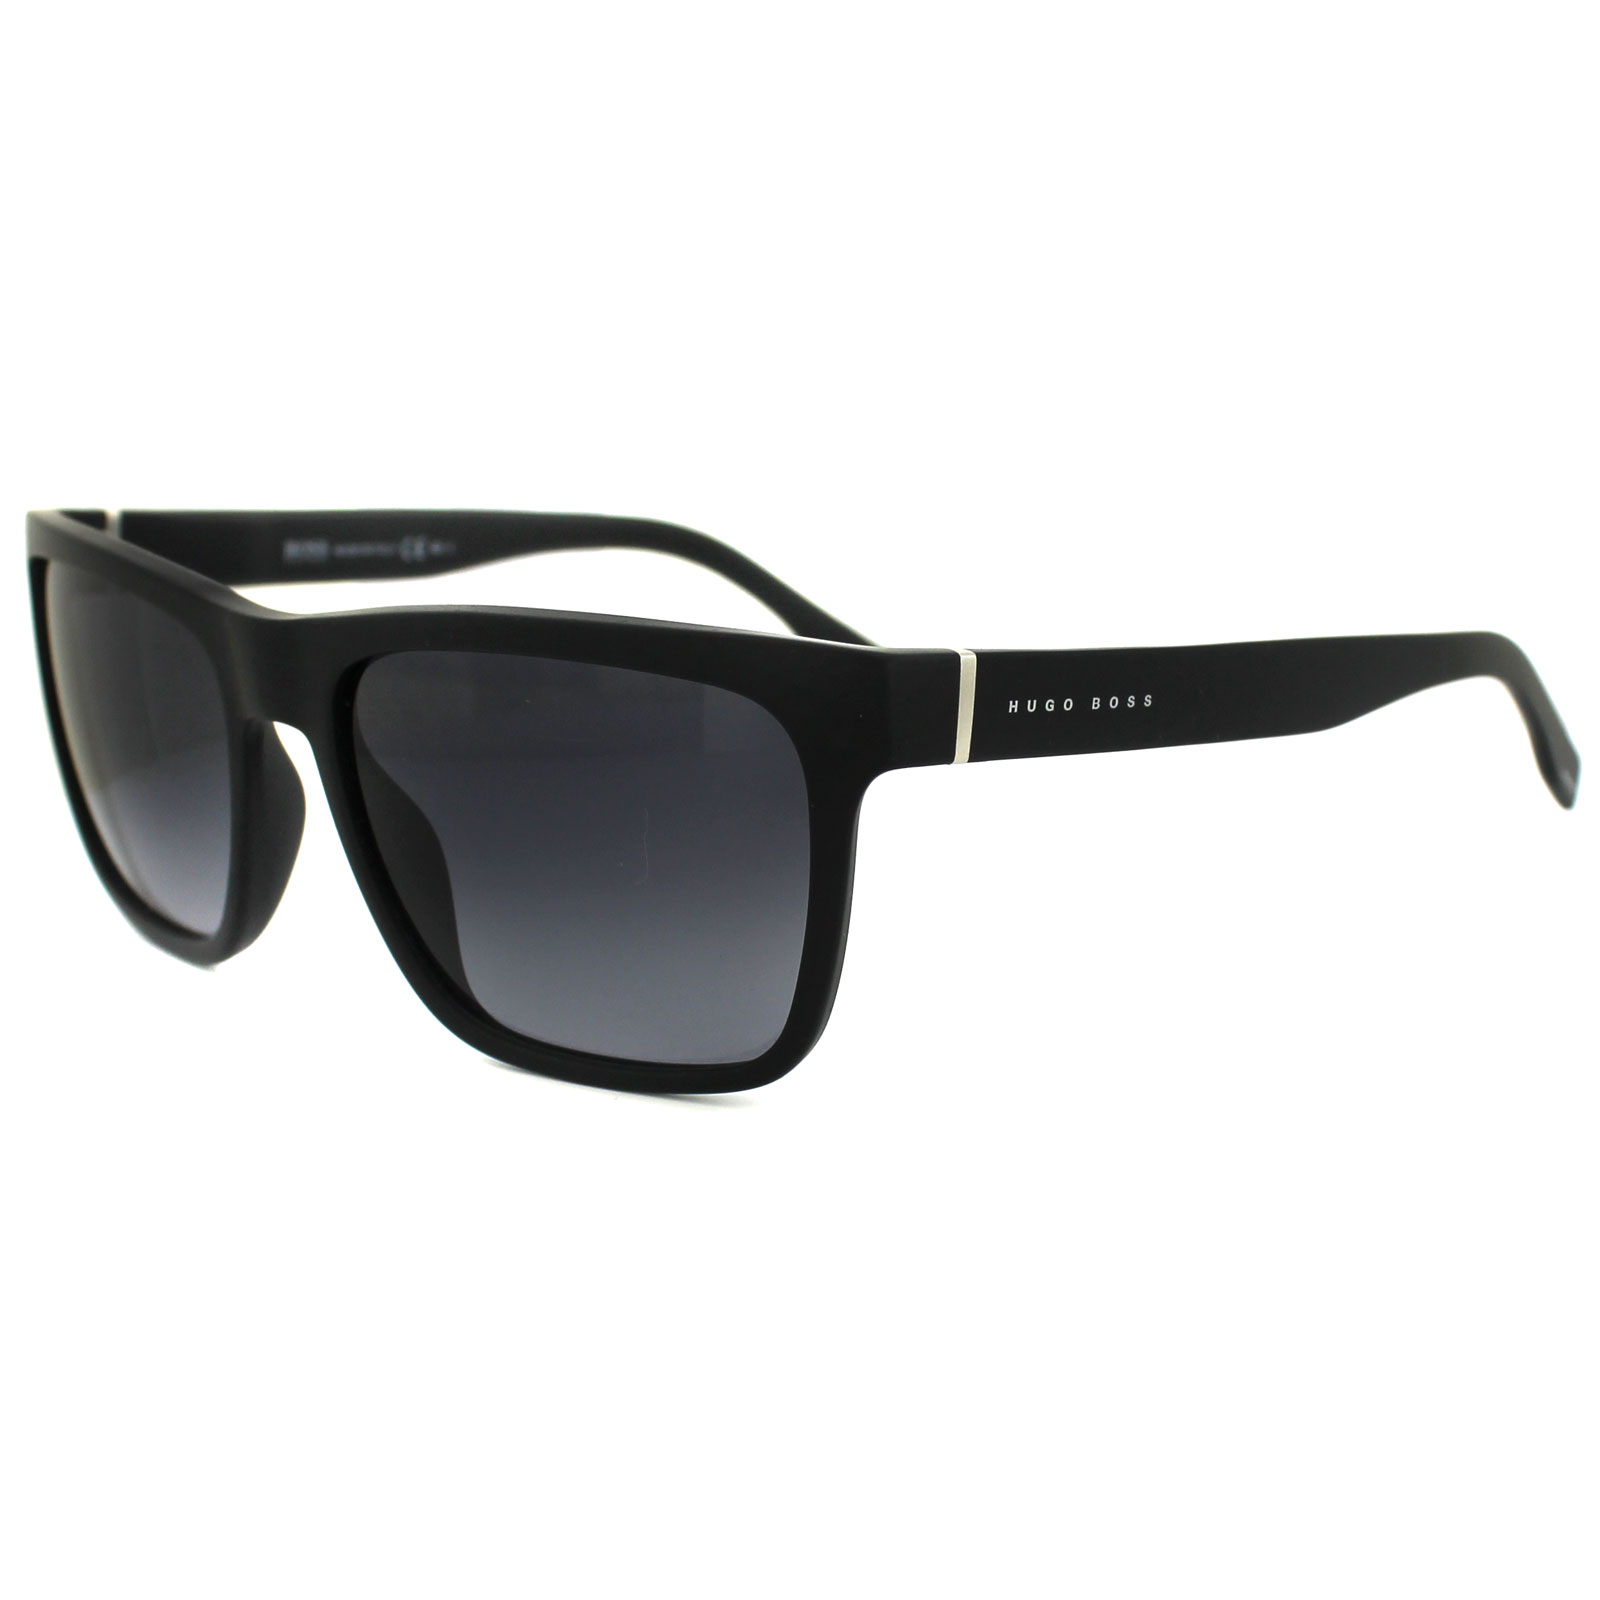 Cheap Hugo Boss 0727 Sunglasses Discounted Sunglasses